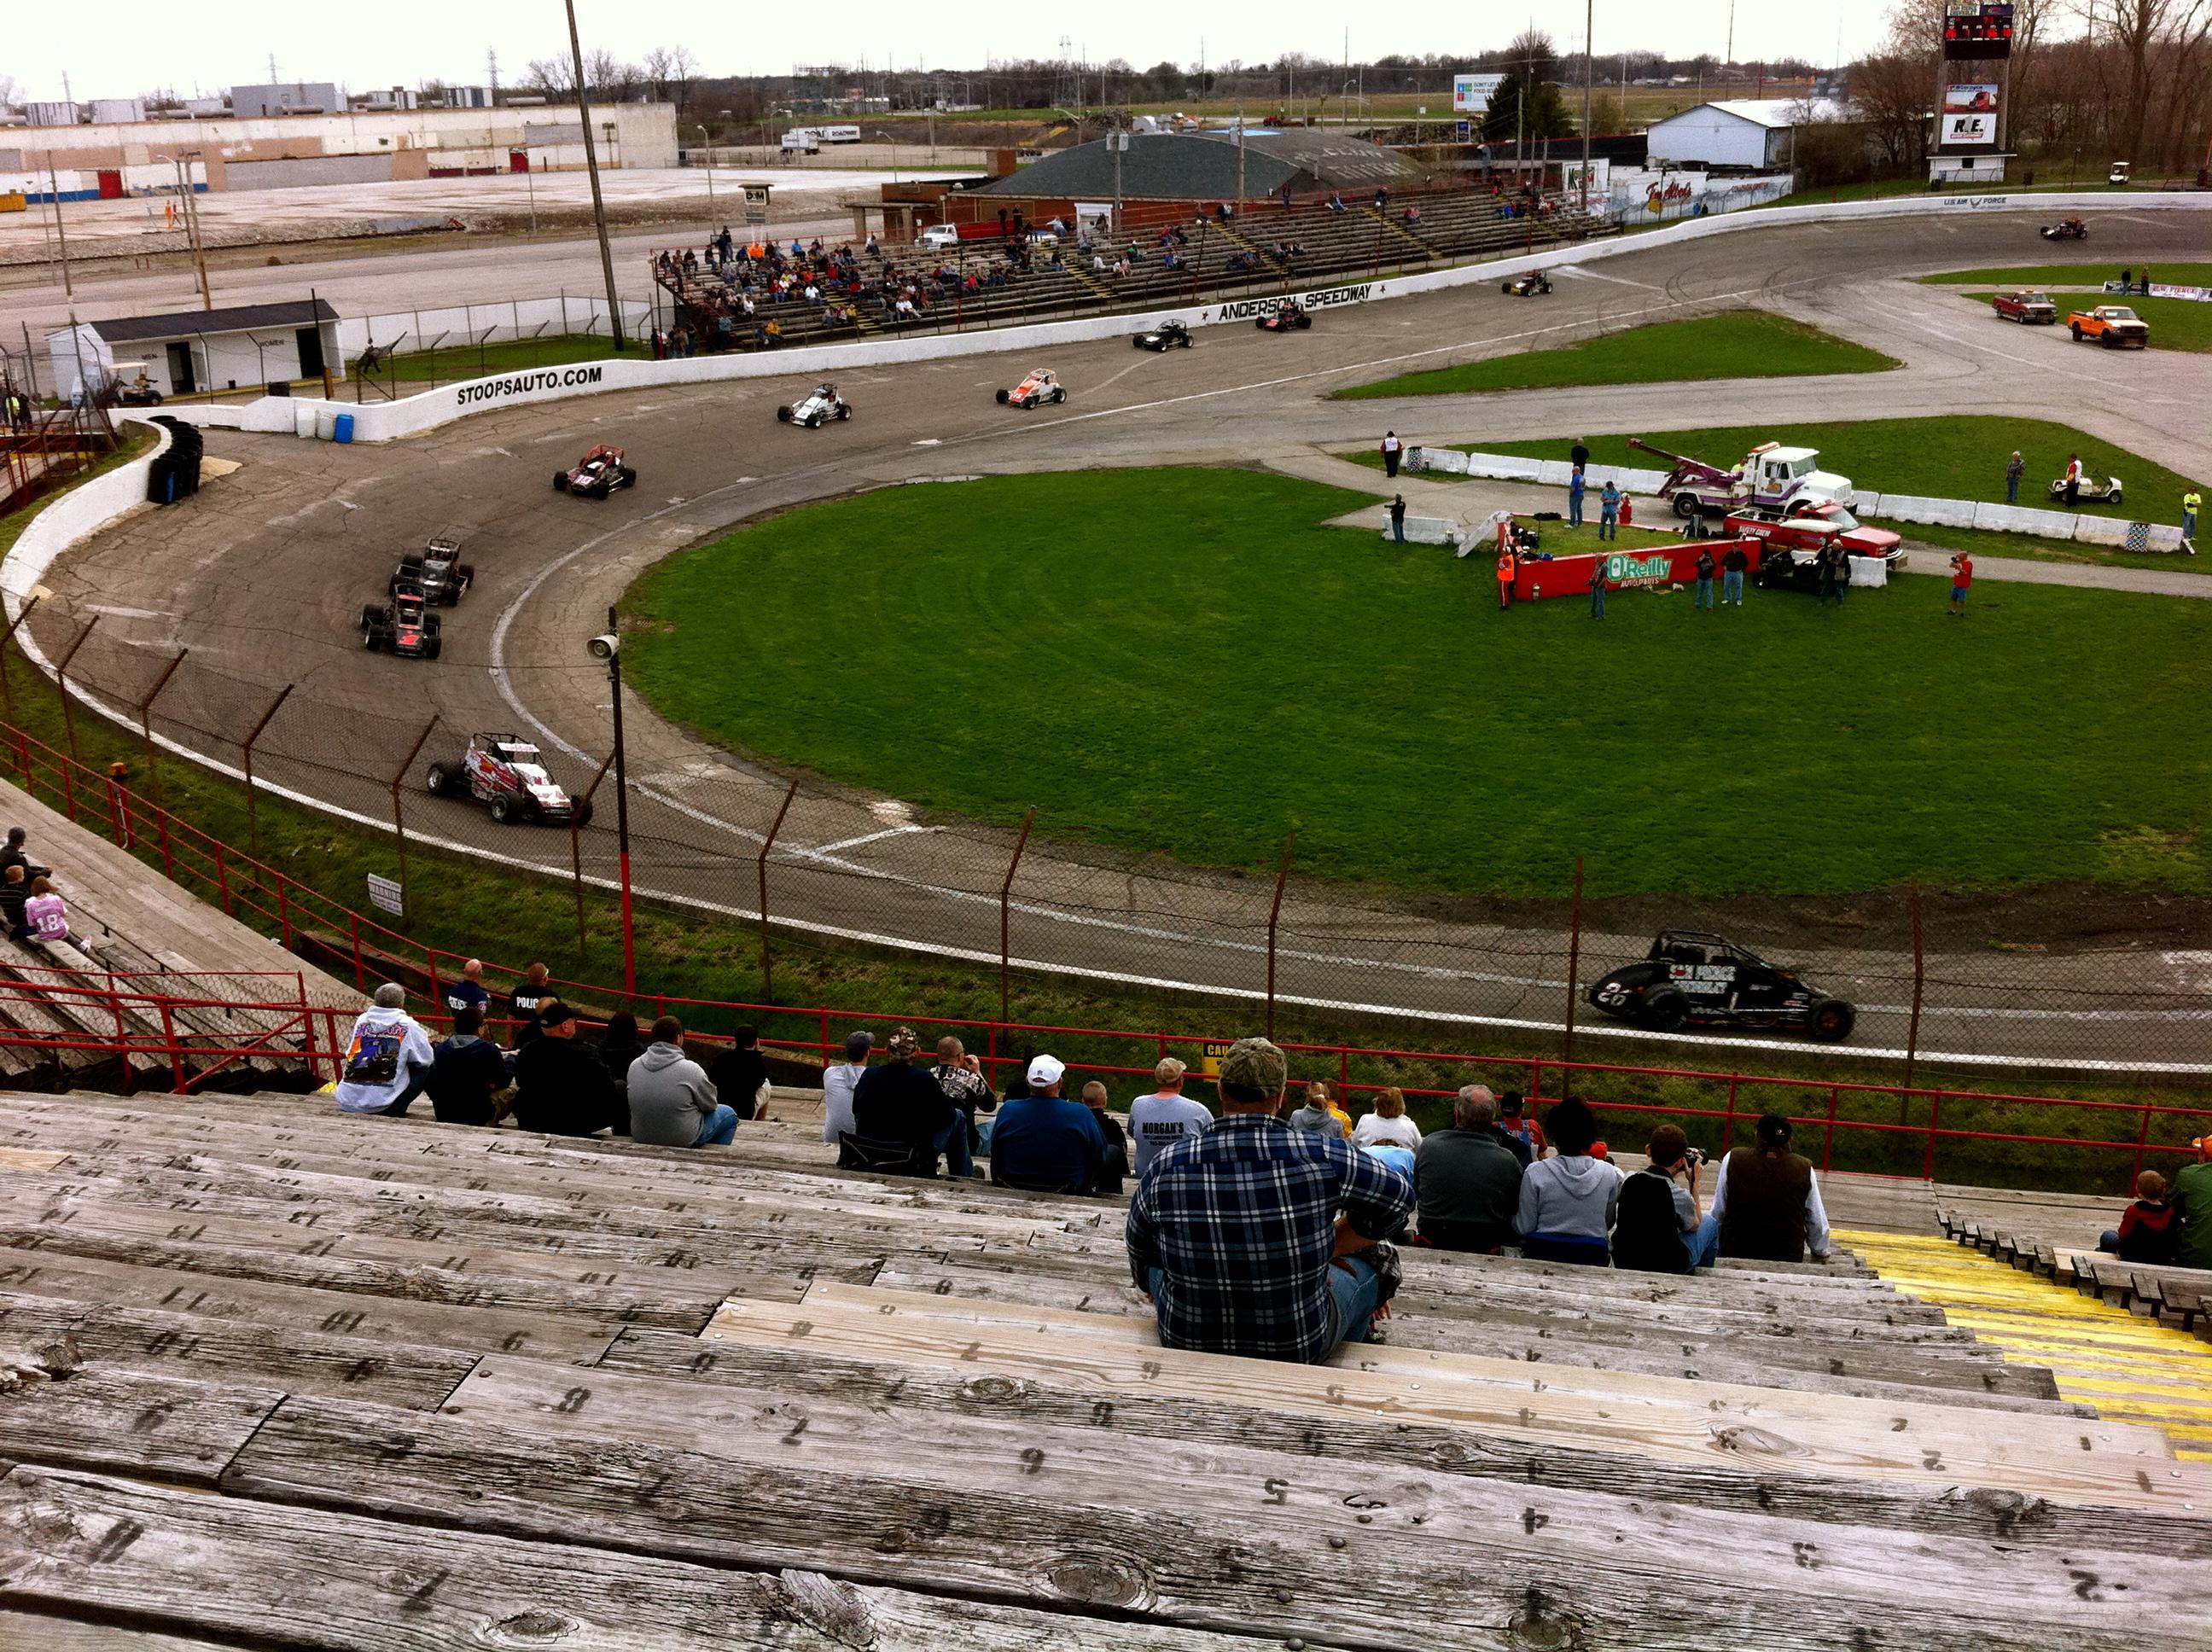 Quarter Mile Race Cars